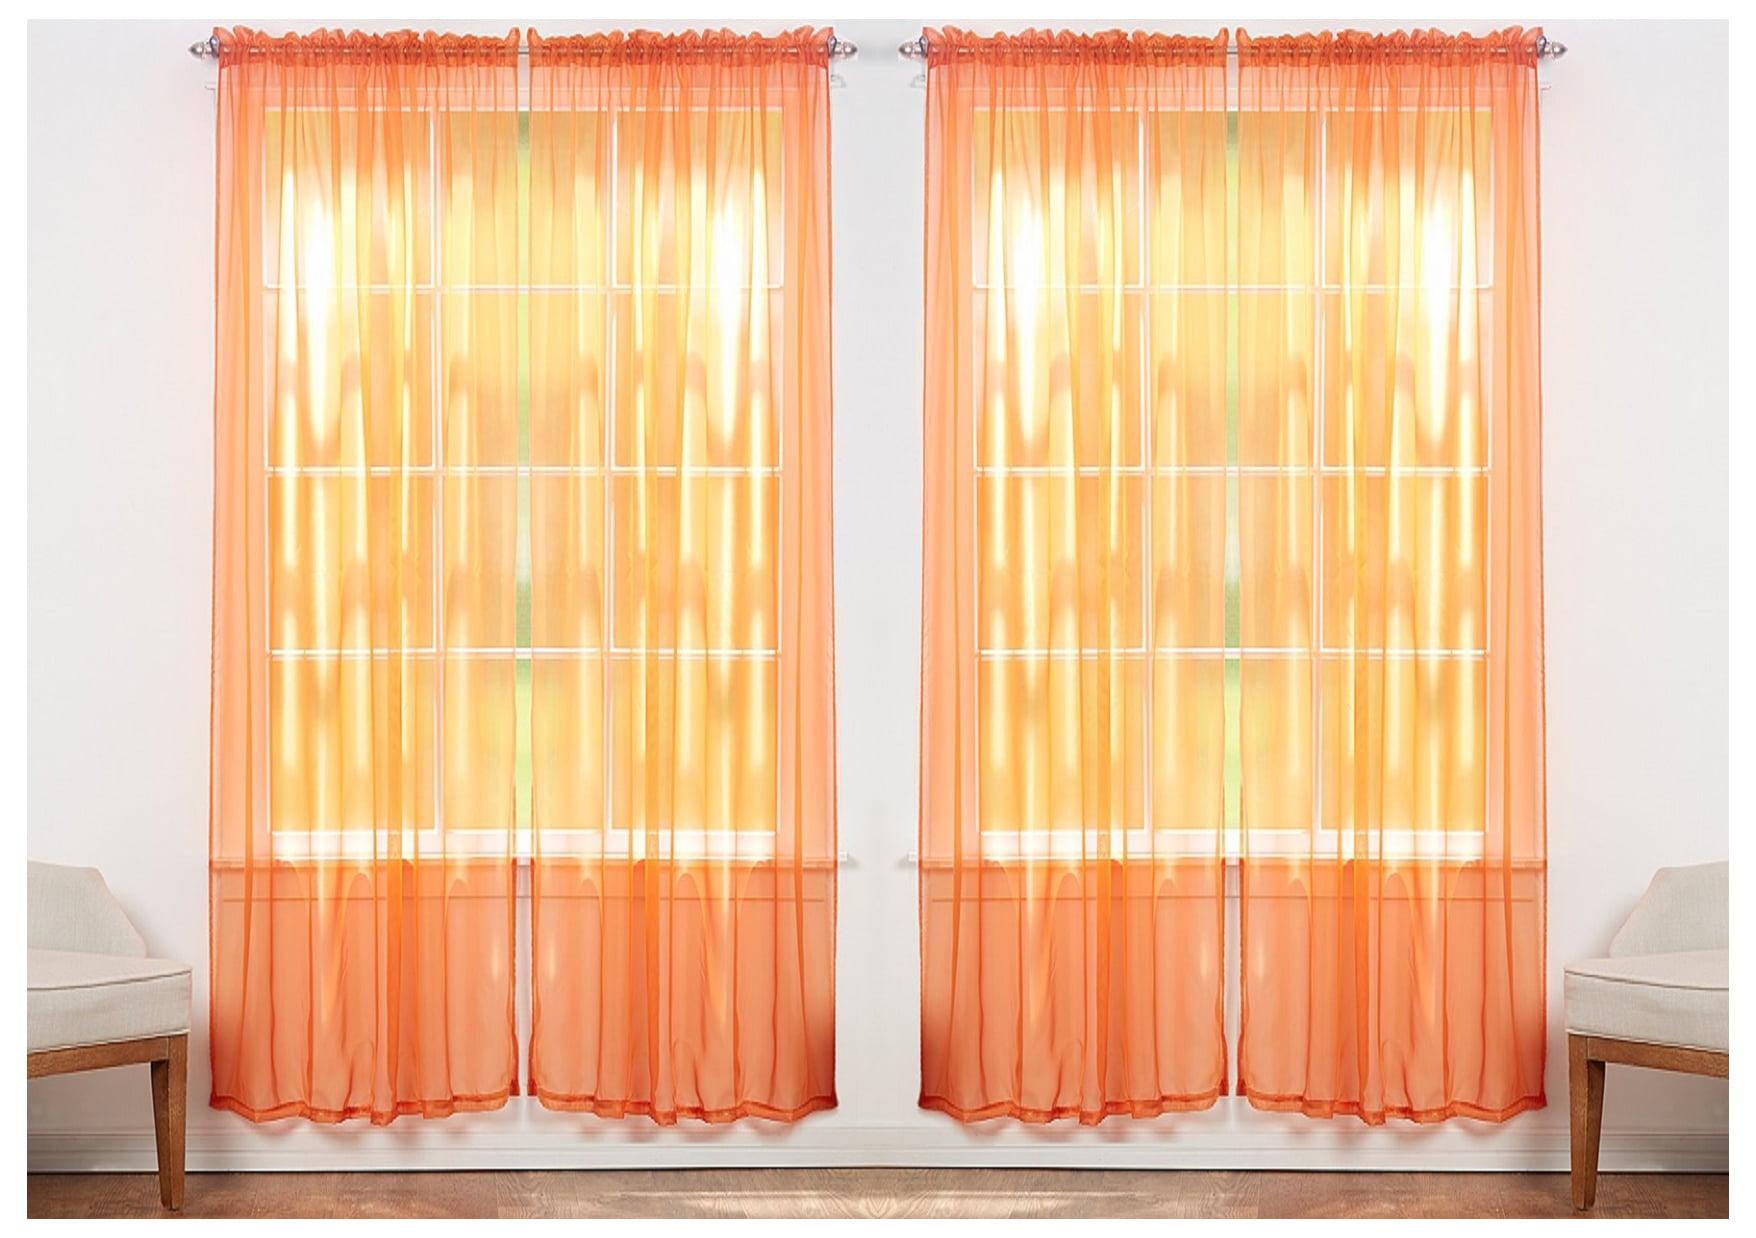 4 Pack Sheer Voile Curtain Panels Assorted Colors Orange Walmart Com Walmart Com